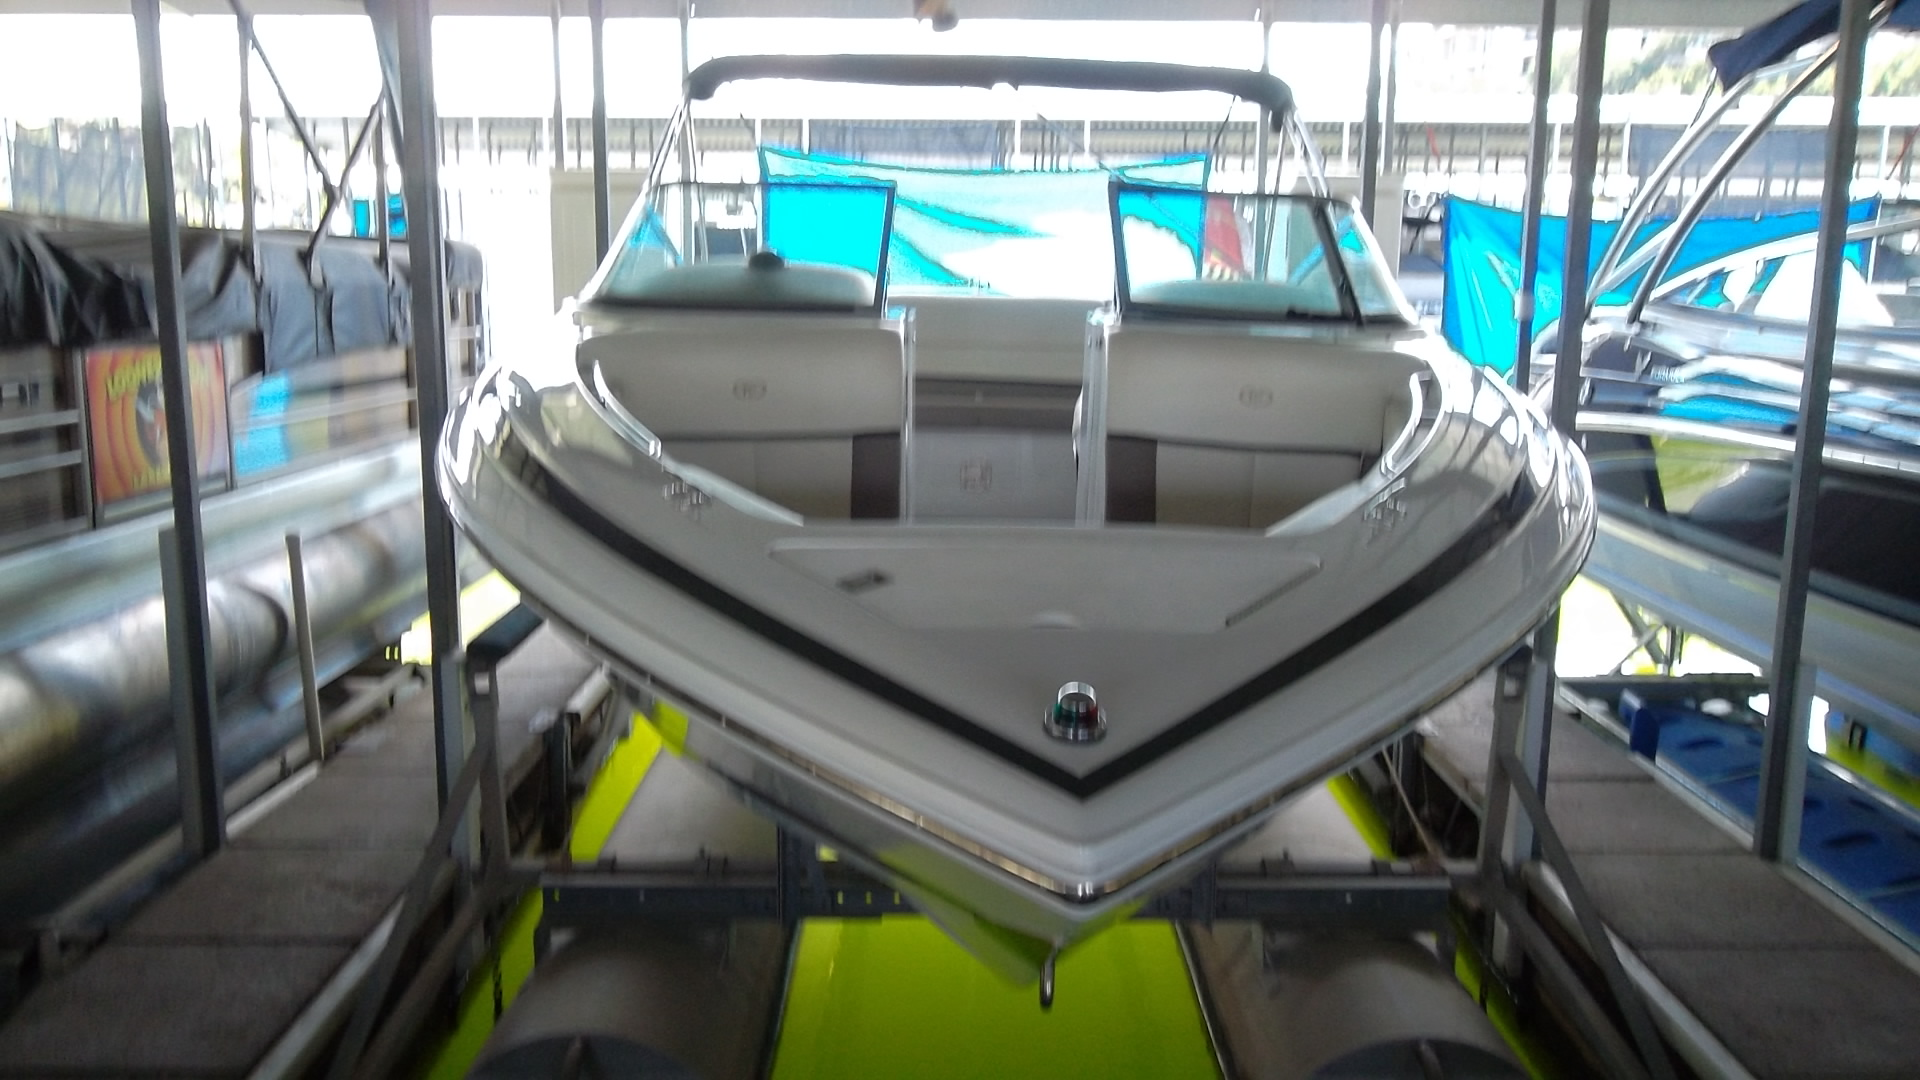 Austin lakeway boats for sale used lake travis Cobalt ...